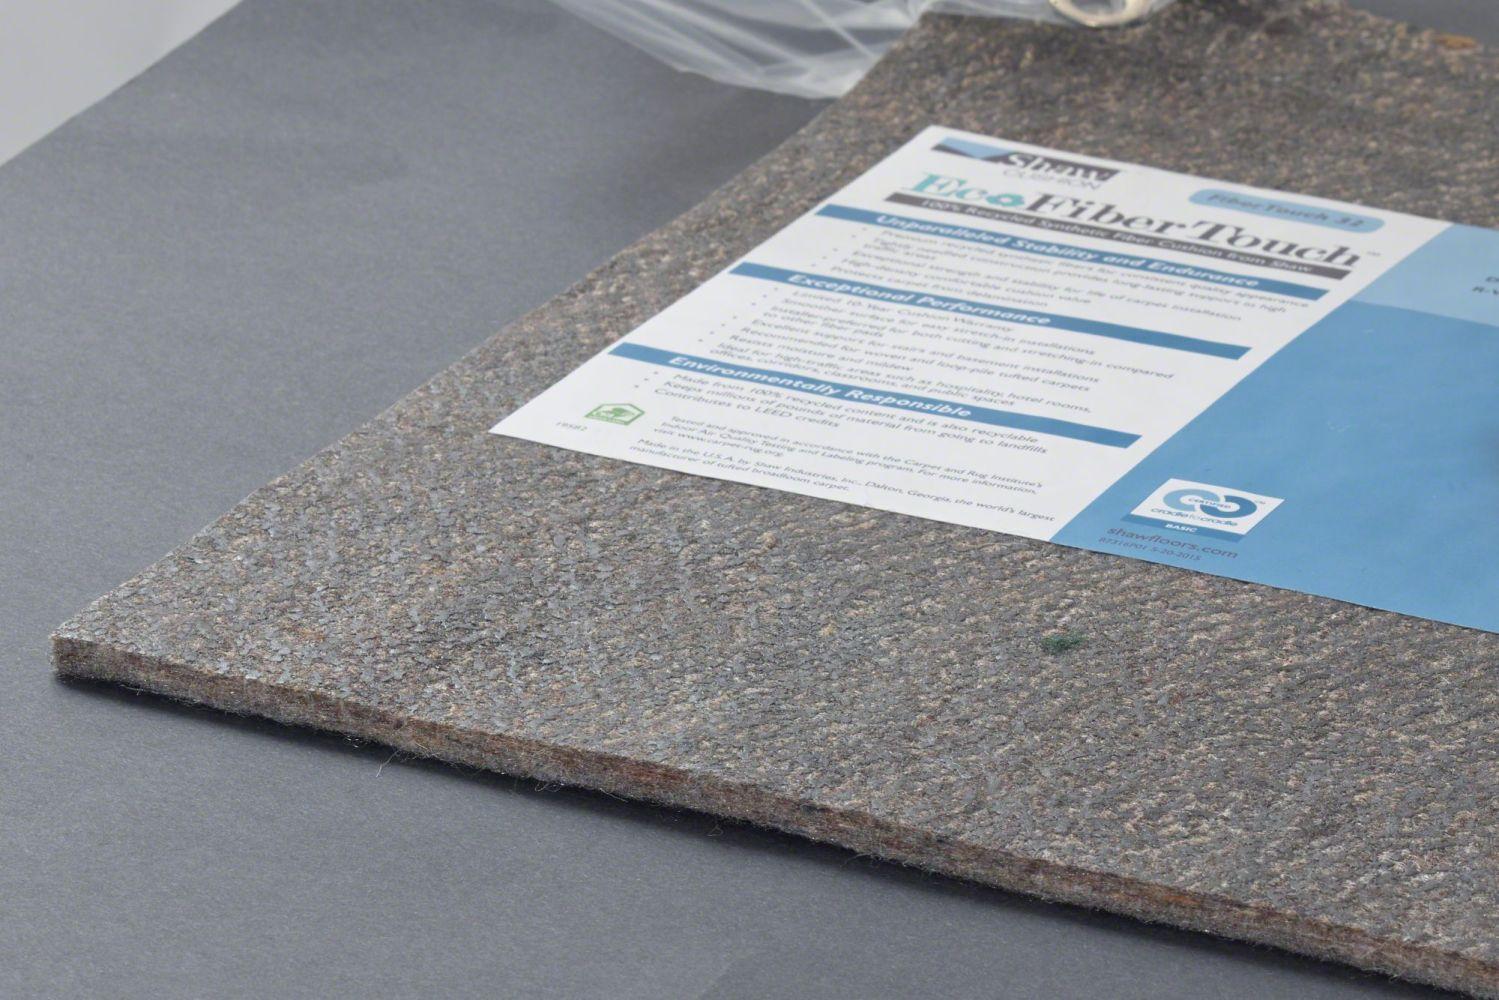 Shaw Floors Eco Edge Cushion Div3fibert32-12 Grey 00001_514PD